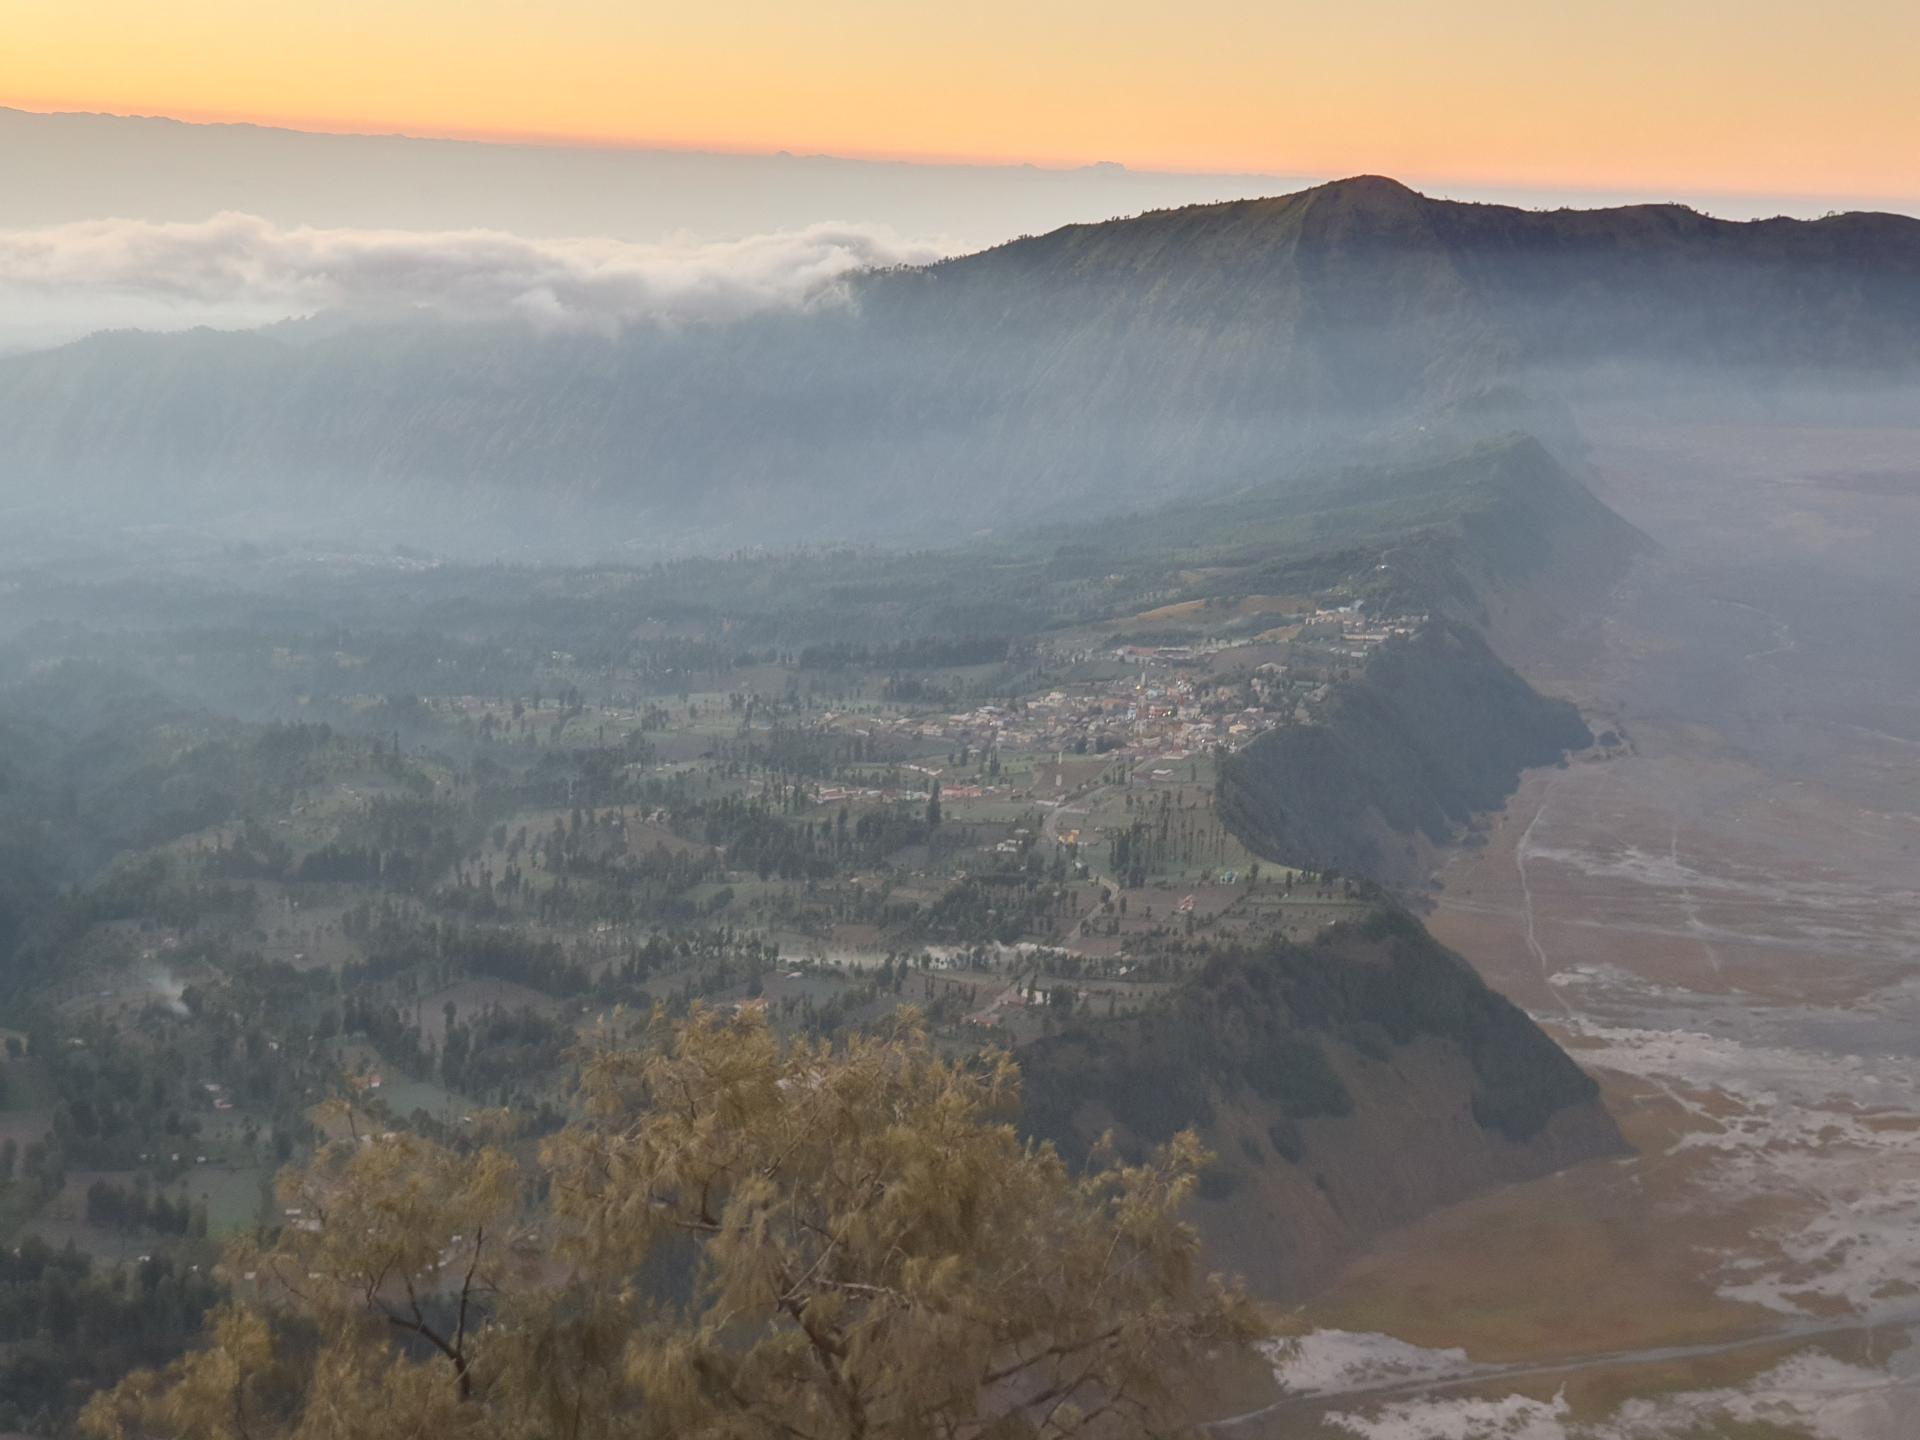 вид на деревню Чеморо-Лаванг с горы Пенанджакан